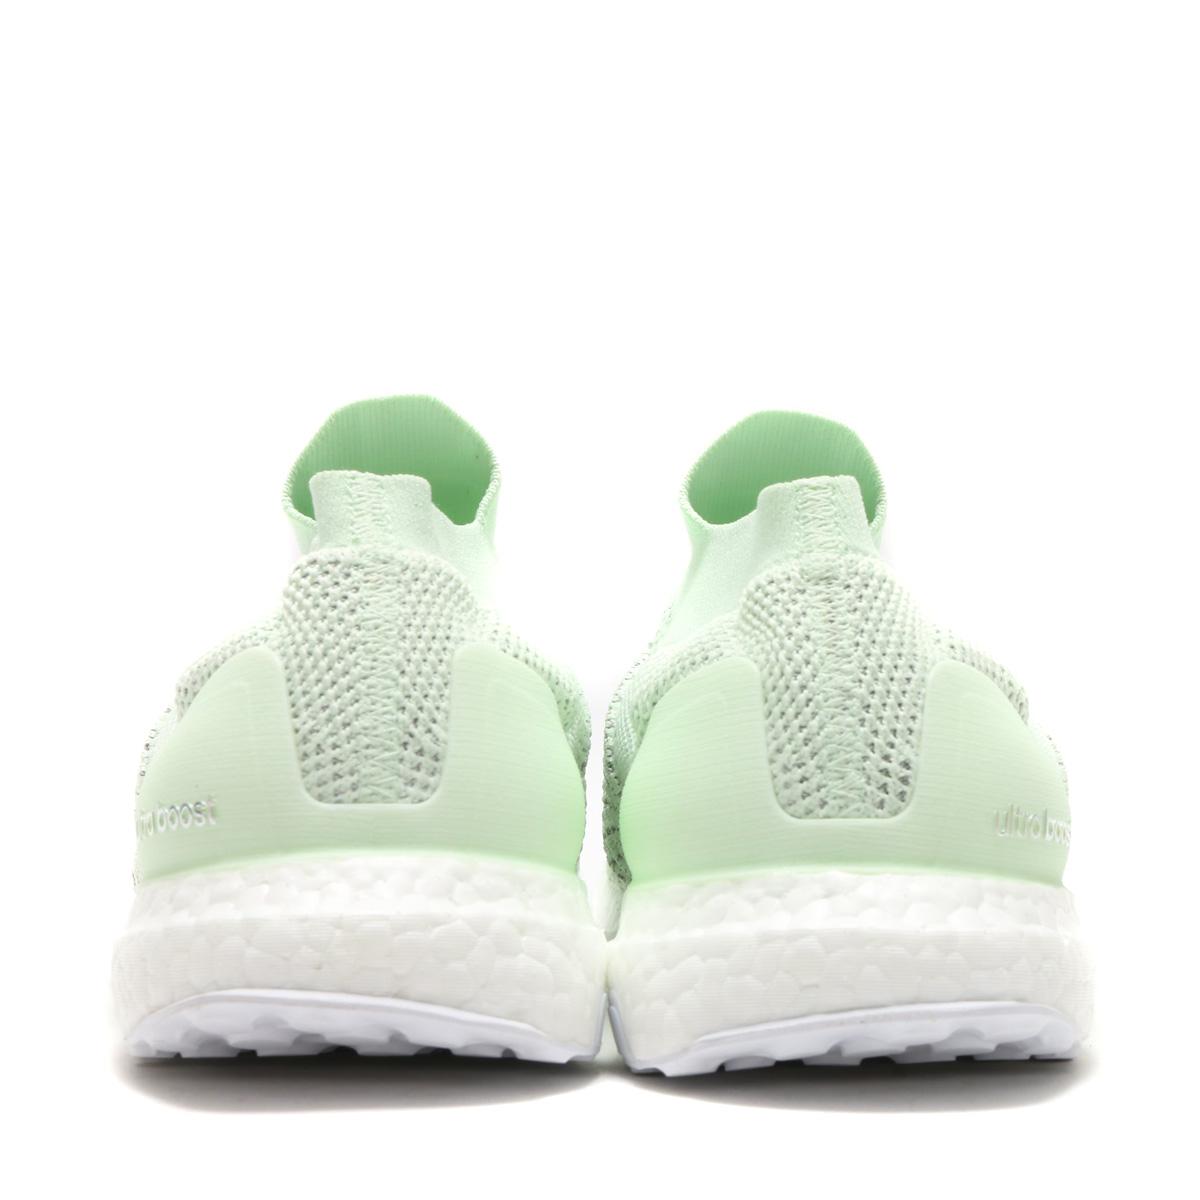 fc3650deb99fd adidas UltraBOOST LACELESS LTD (Adidas ultra boost raceless LTD) Ash Green Aero  Green Ftwr White 18SS-S